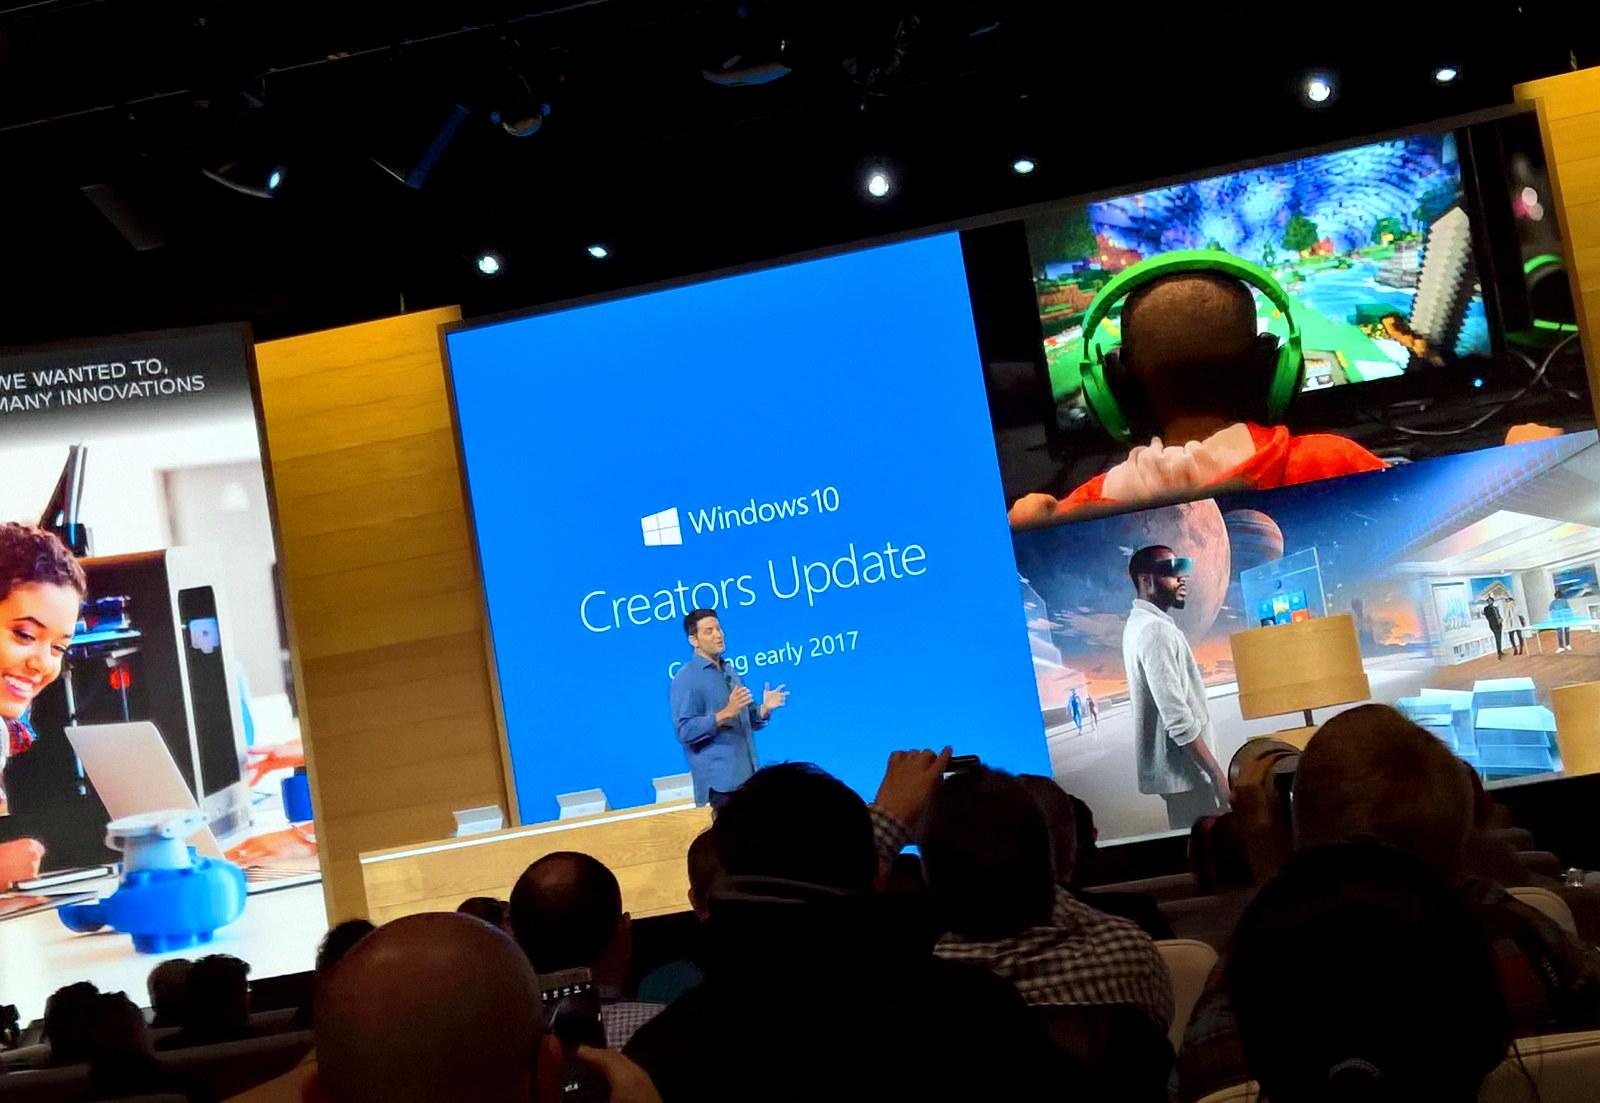 Windows 10 Creators Update coming in early 2017